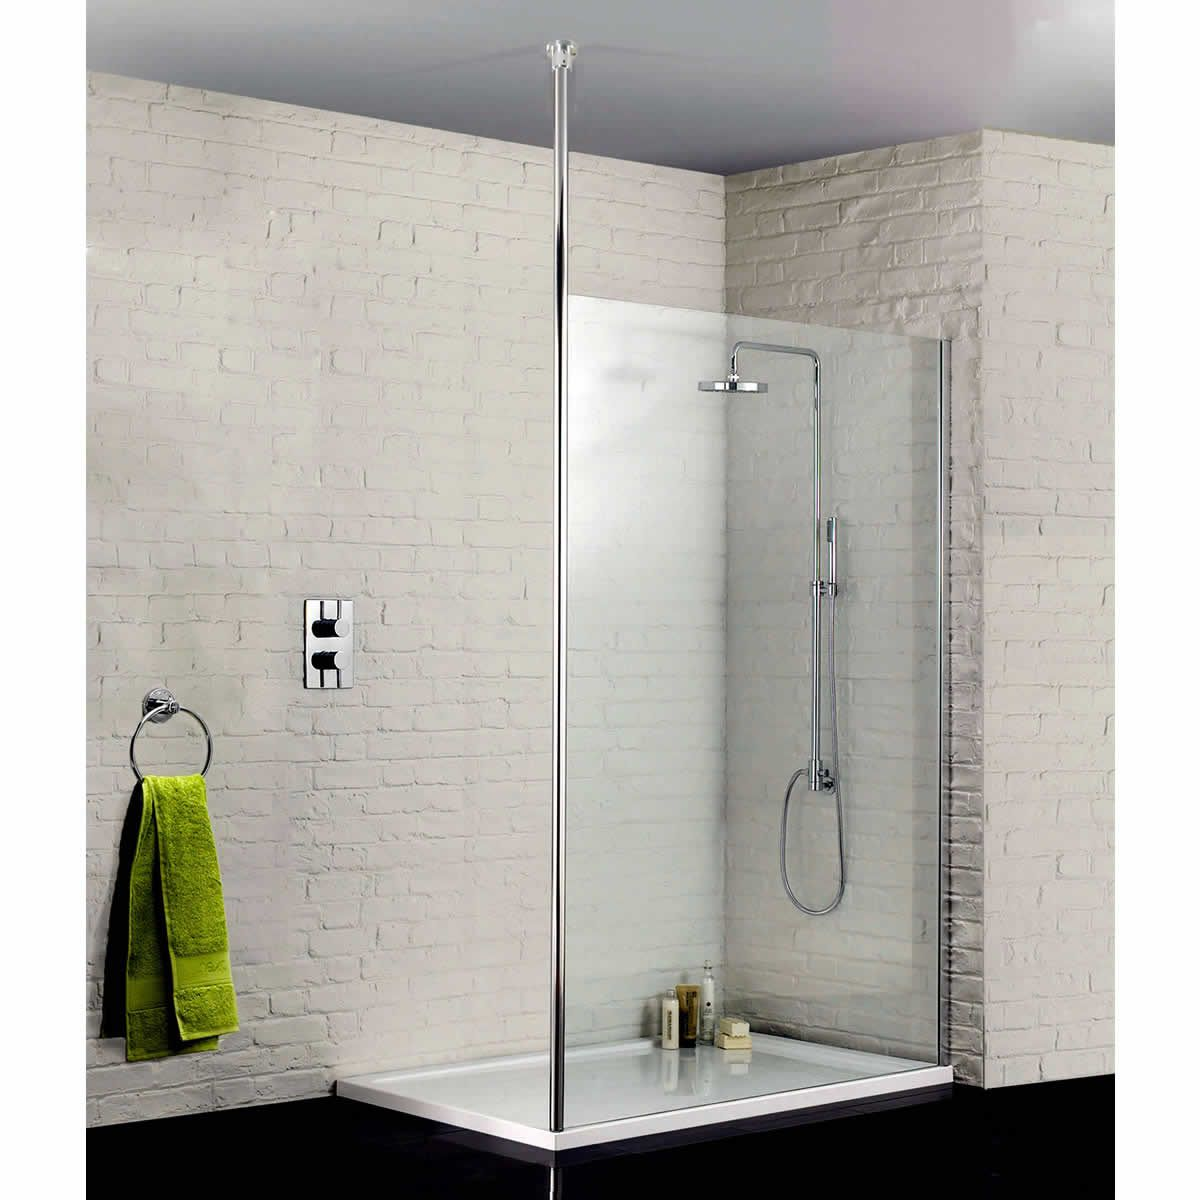 Sommer glass wetroom panel uk bathrooms Shower glass panel